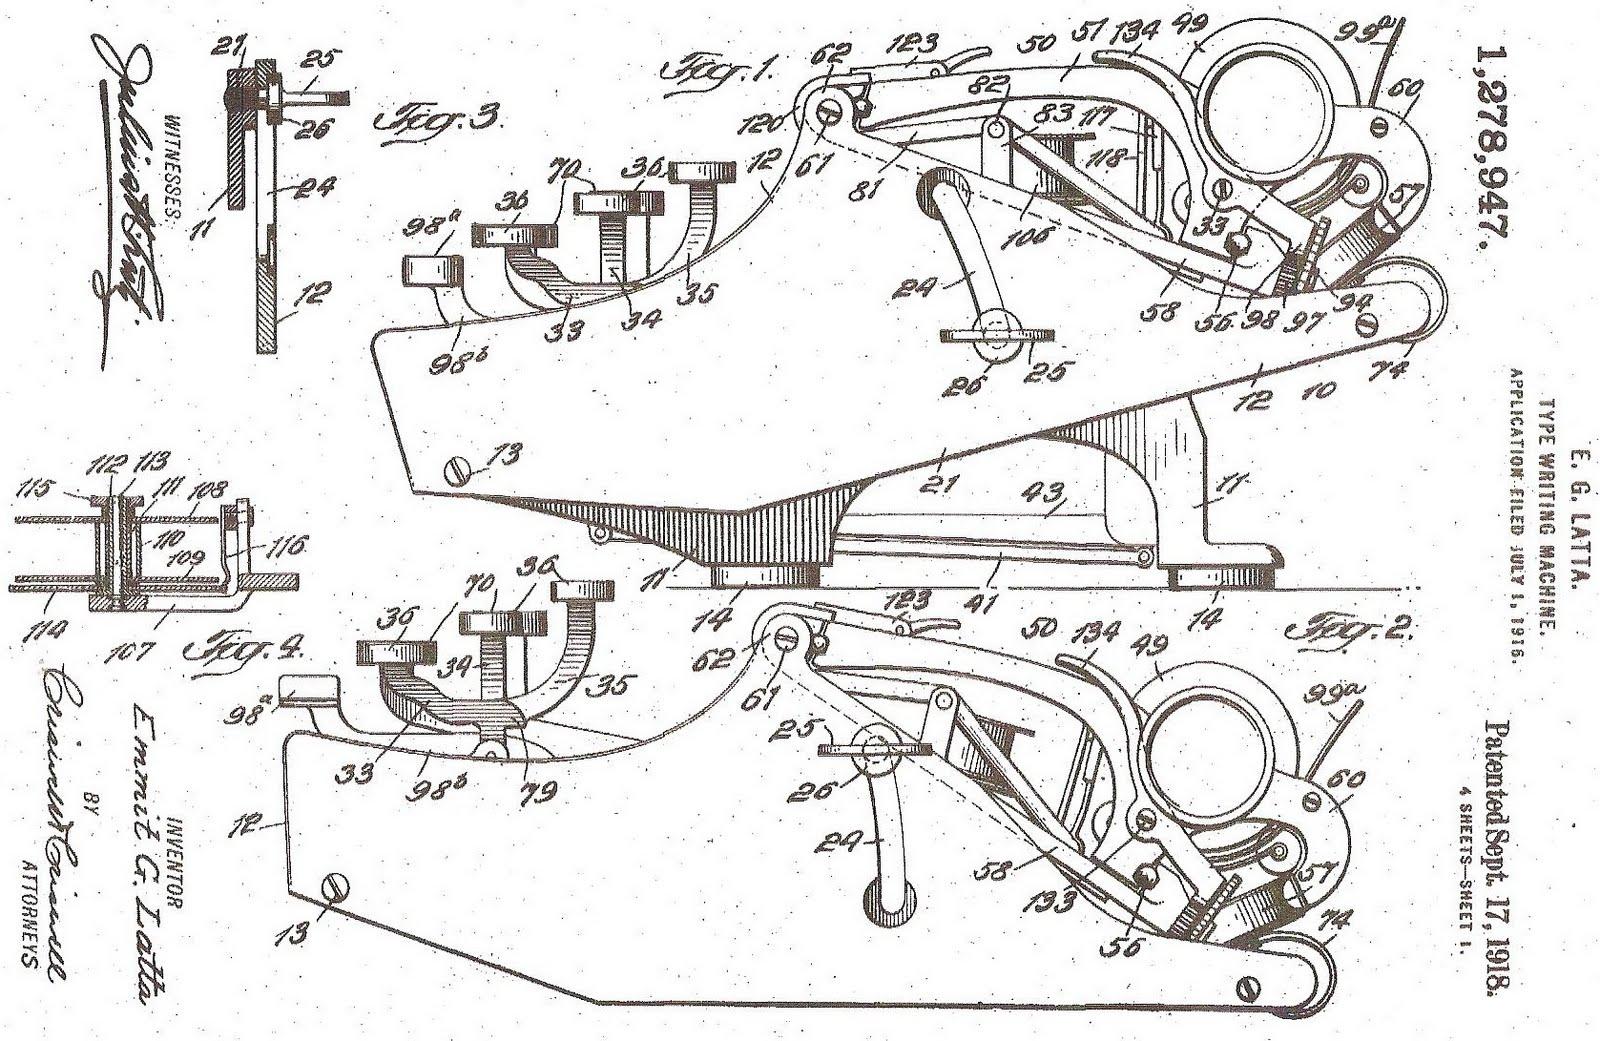 oz.Typewriter: On This Day in Typewriter History (XLII)